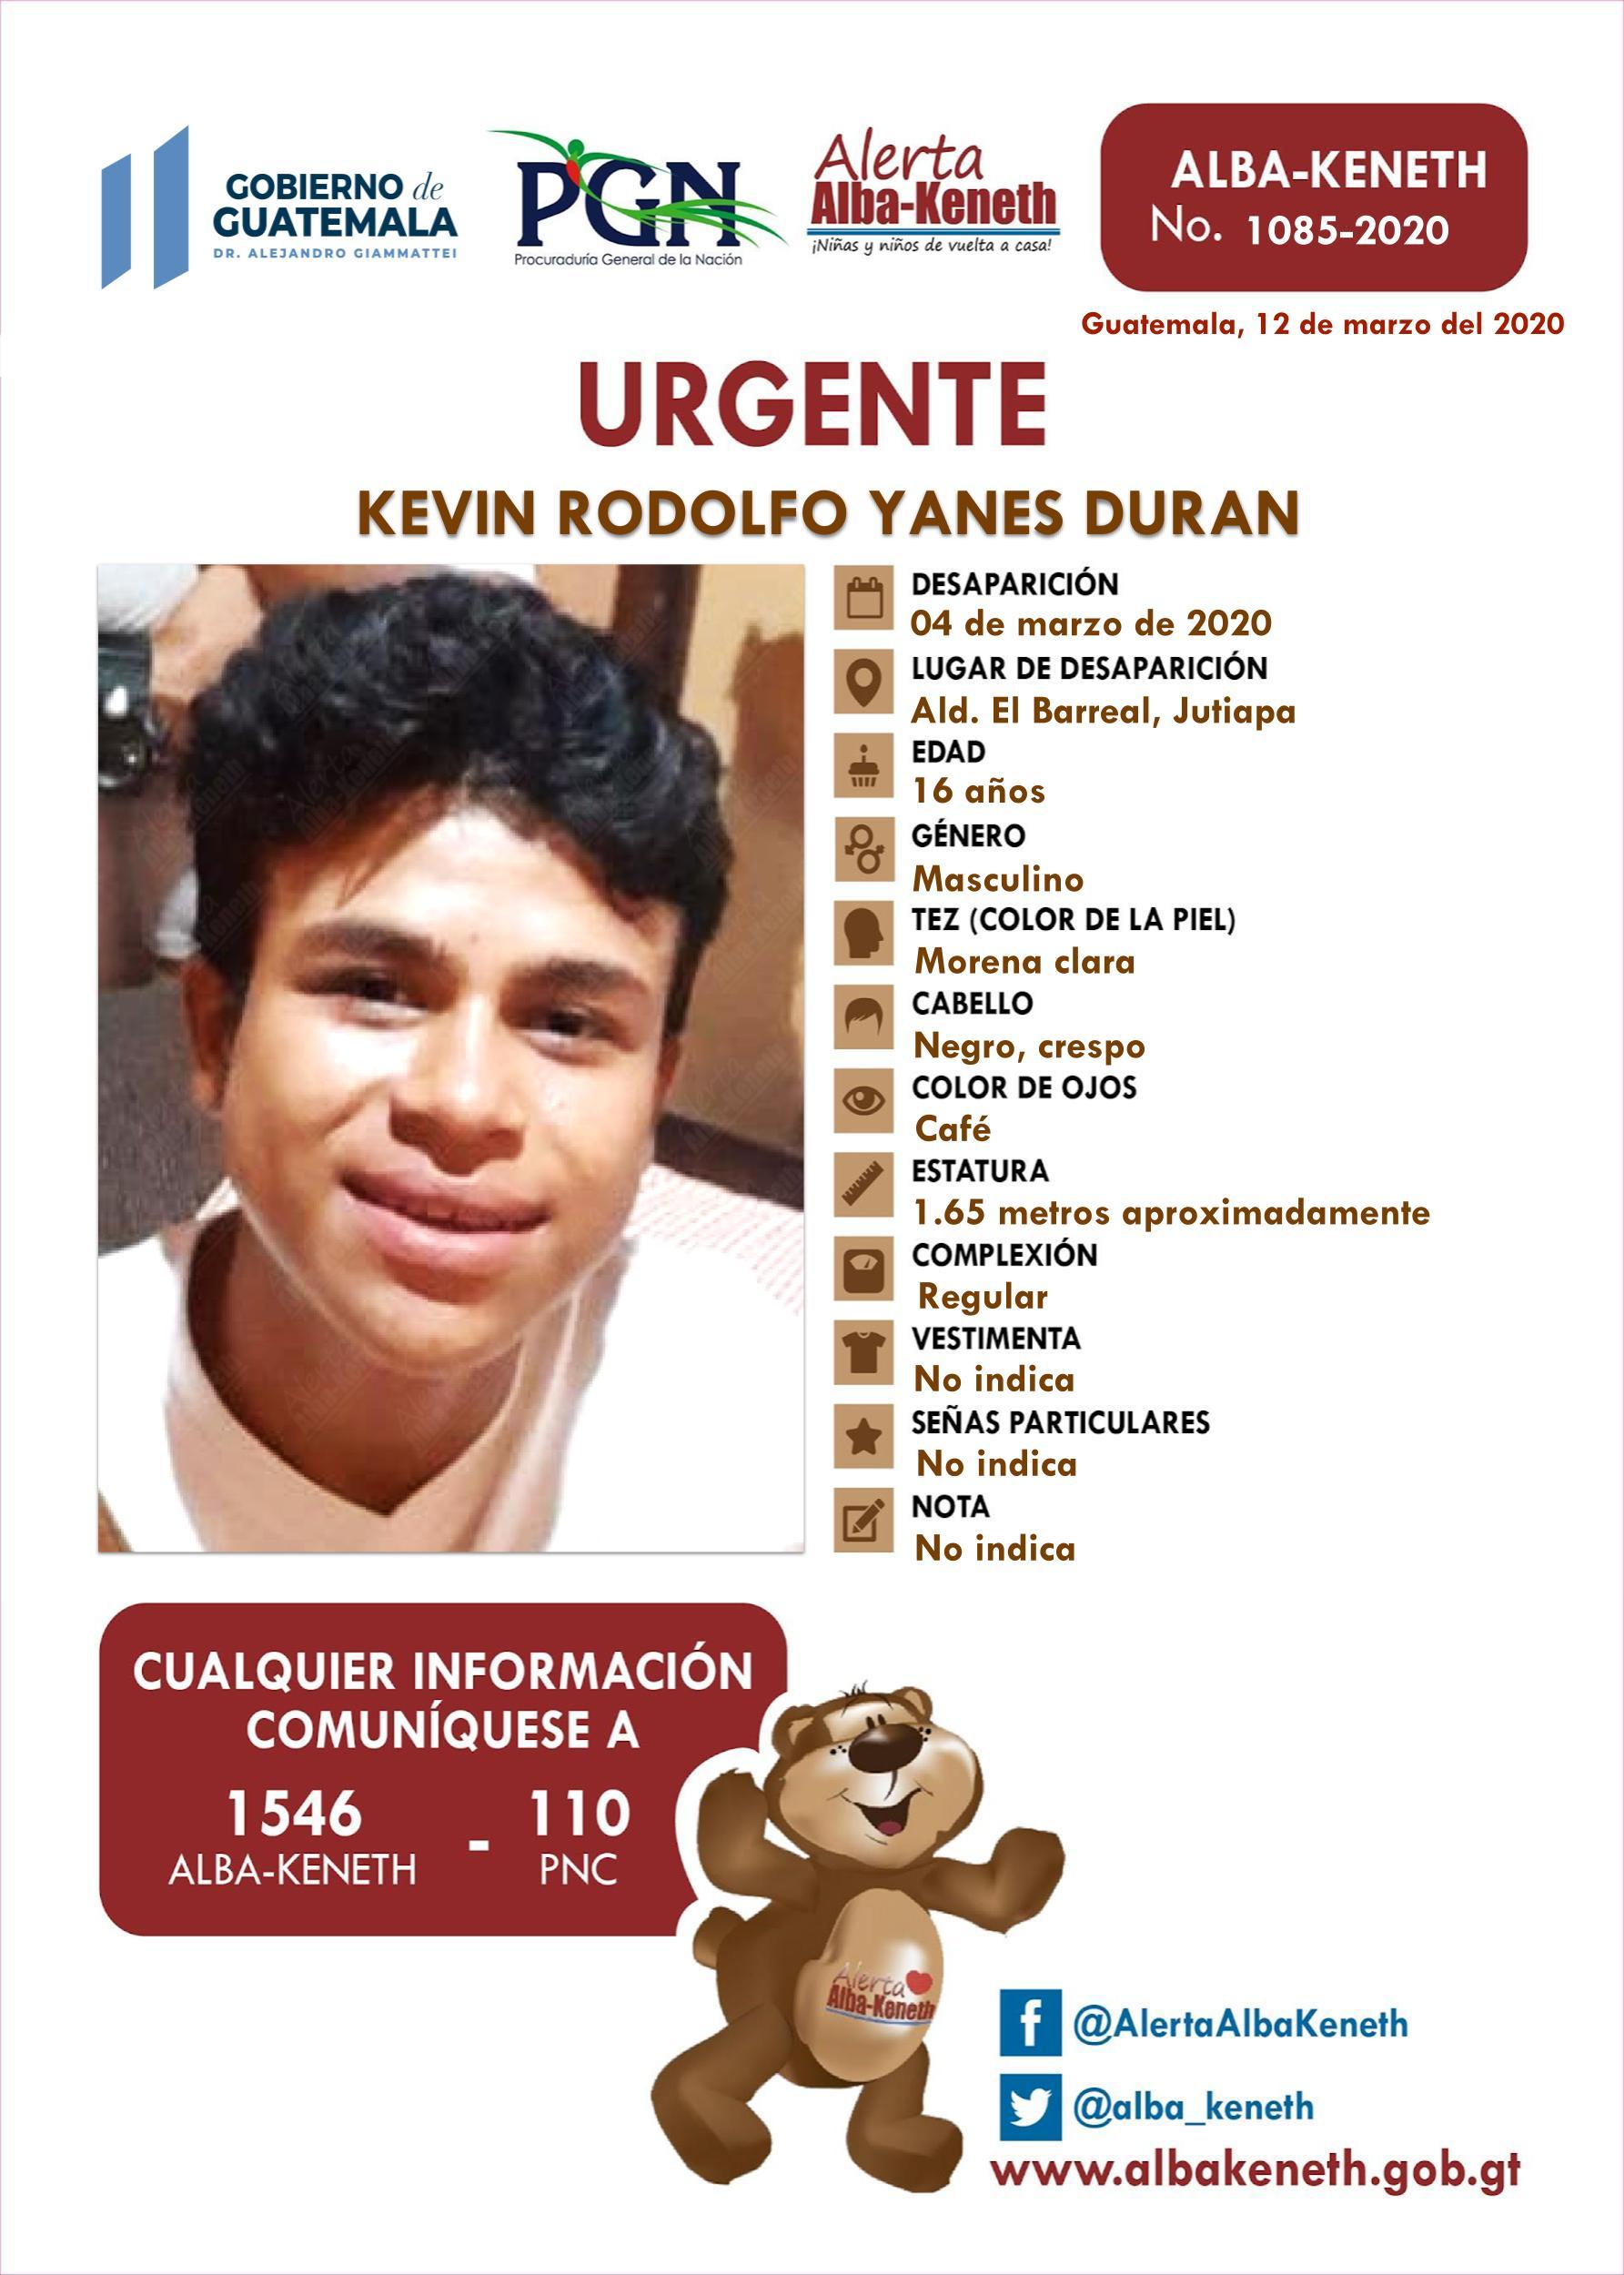 Kevin Rodolfo Yanes Duran